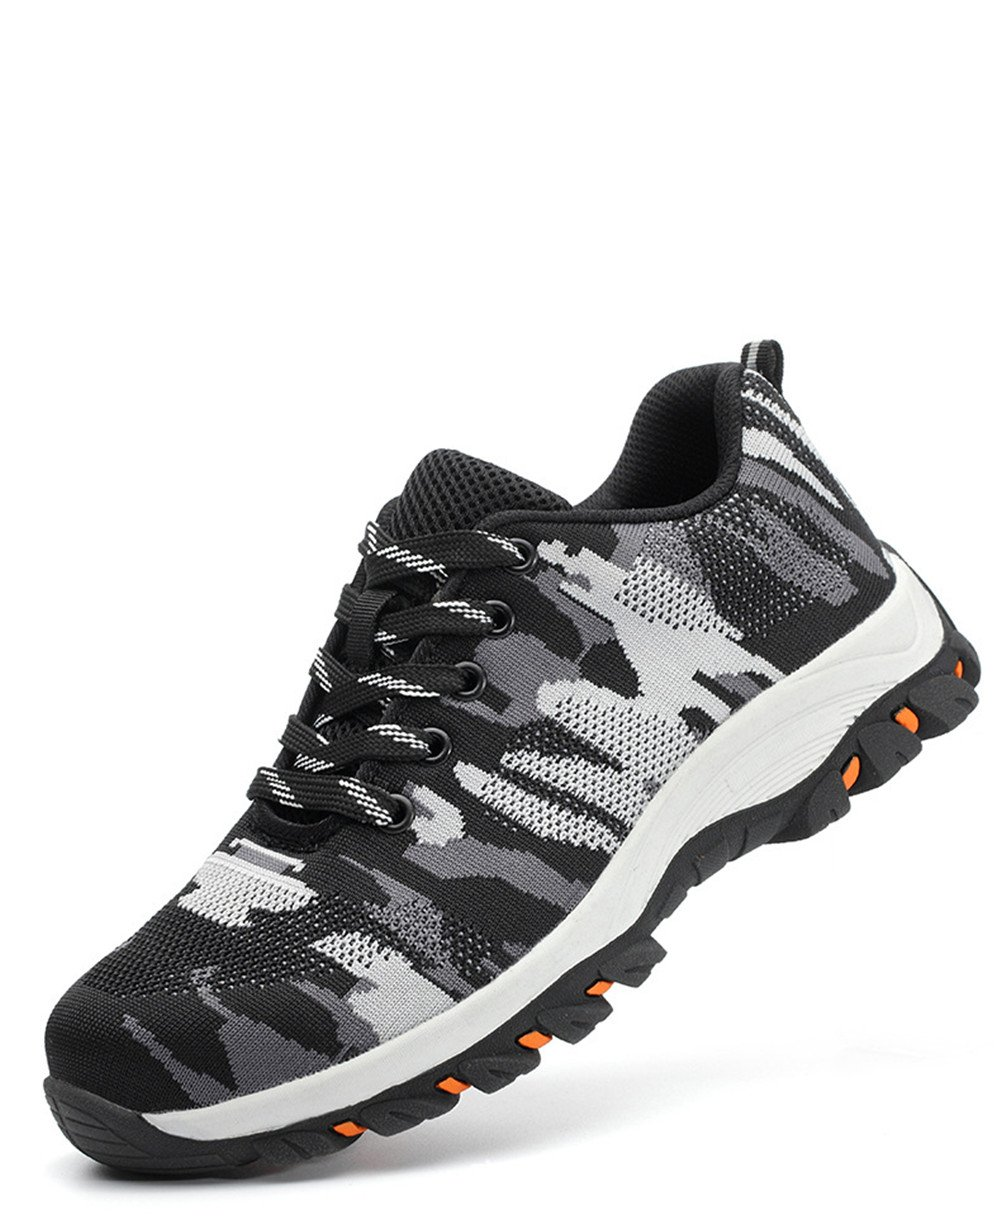 Work Women's Men's Steel Toe Slip Resistant Safety Shoes Lightweight Industrial & Construction Shoe (US 9 B(M) /6.5 D(M), Grey Camouflage)